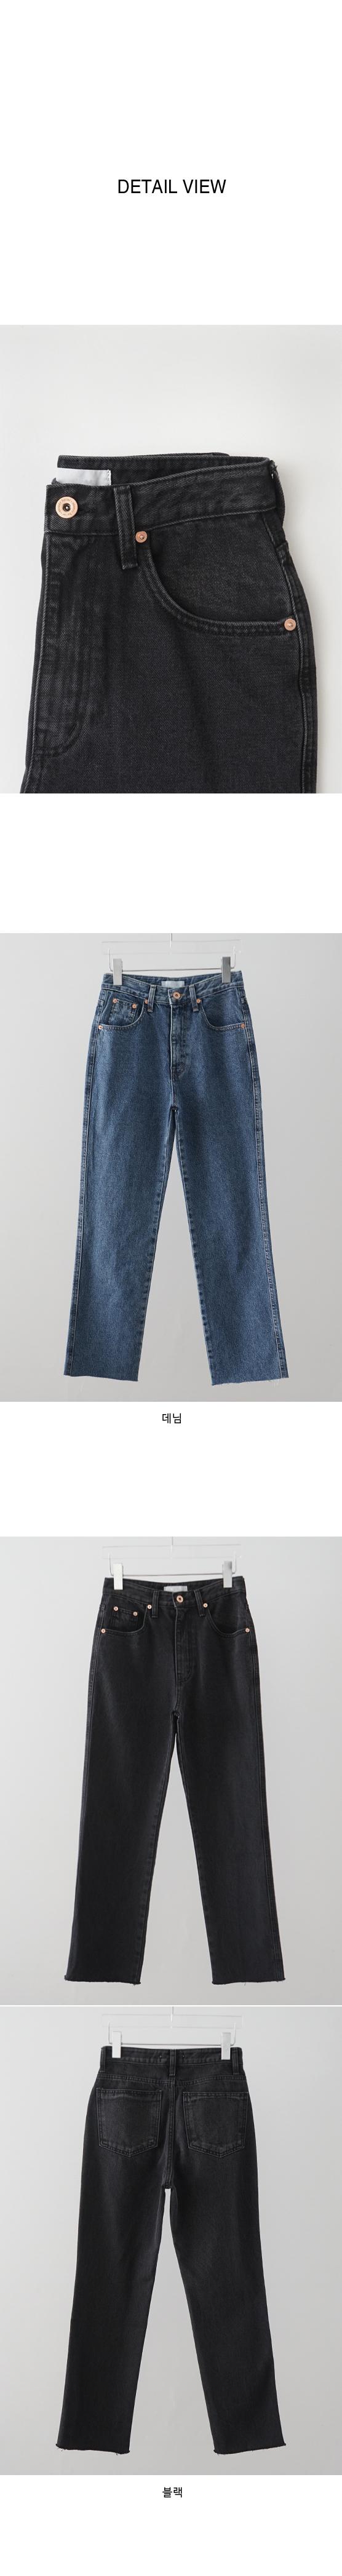 cut-off slim fit denim pants